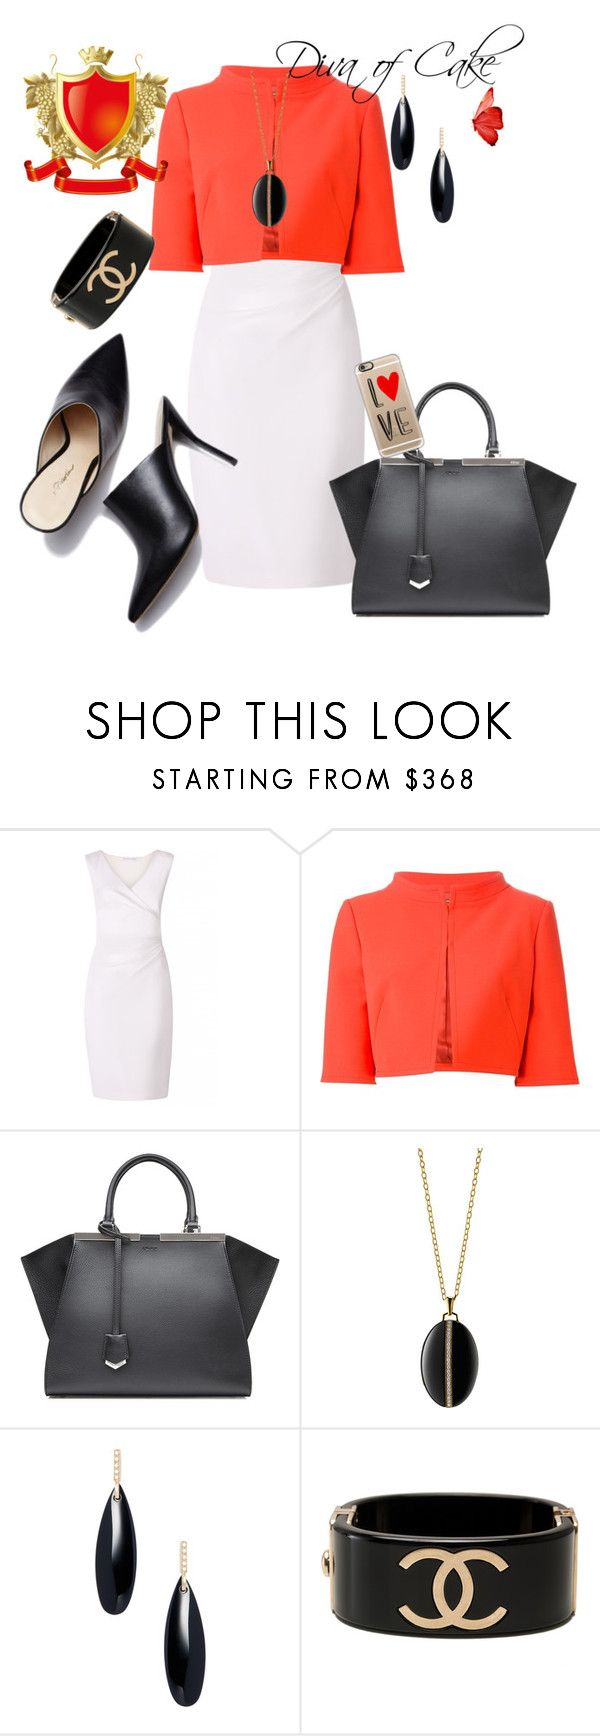 """White orange and black outfit"" by kercey ❤ liked on Polyvore featuring Diane Von Furstenberg, Alberta Ferretti, Fendi, Monica Rich Kosann, Janis Savitt, Chanel and Casetify"